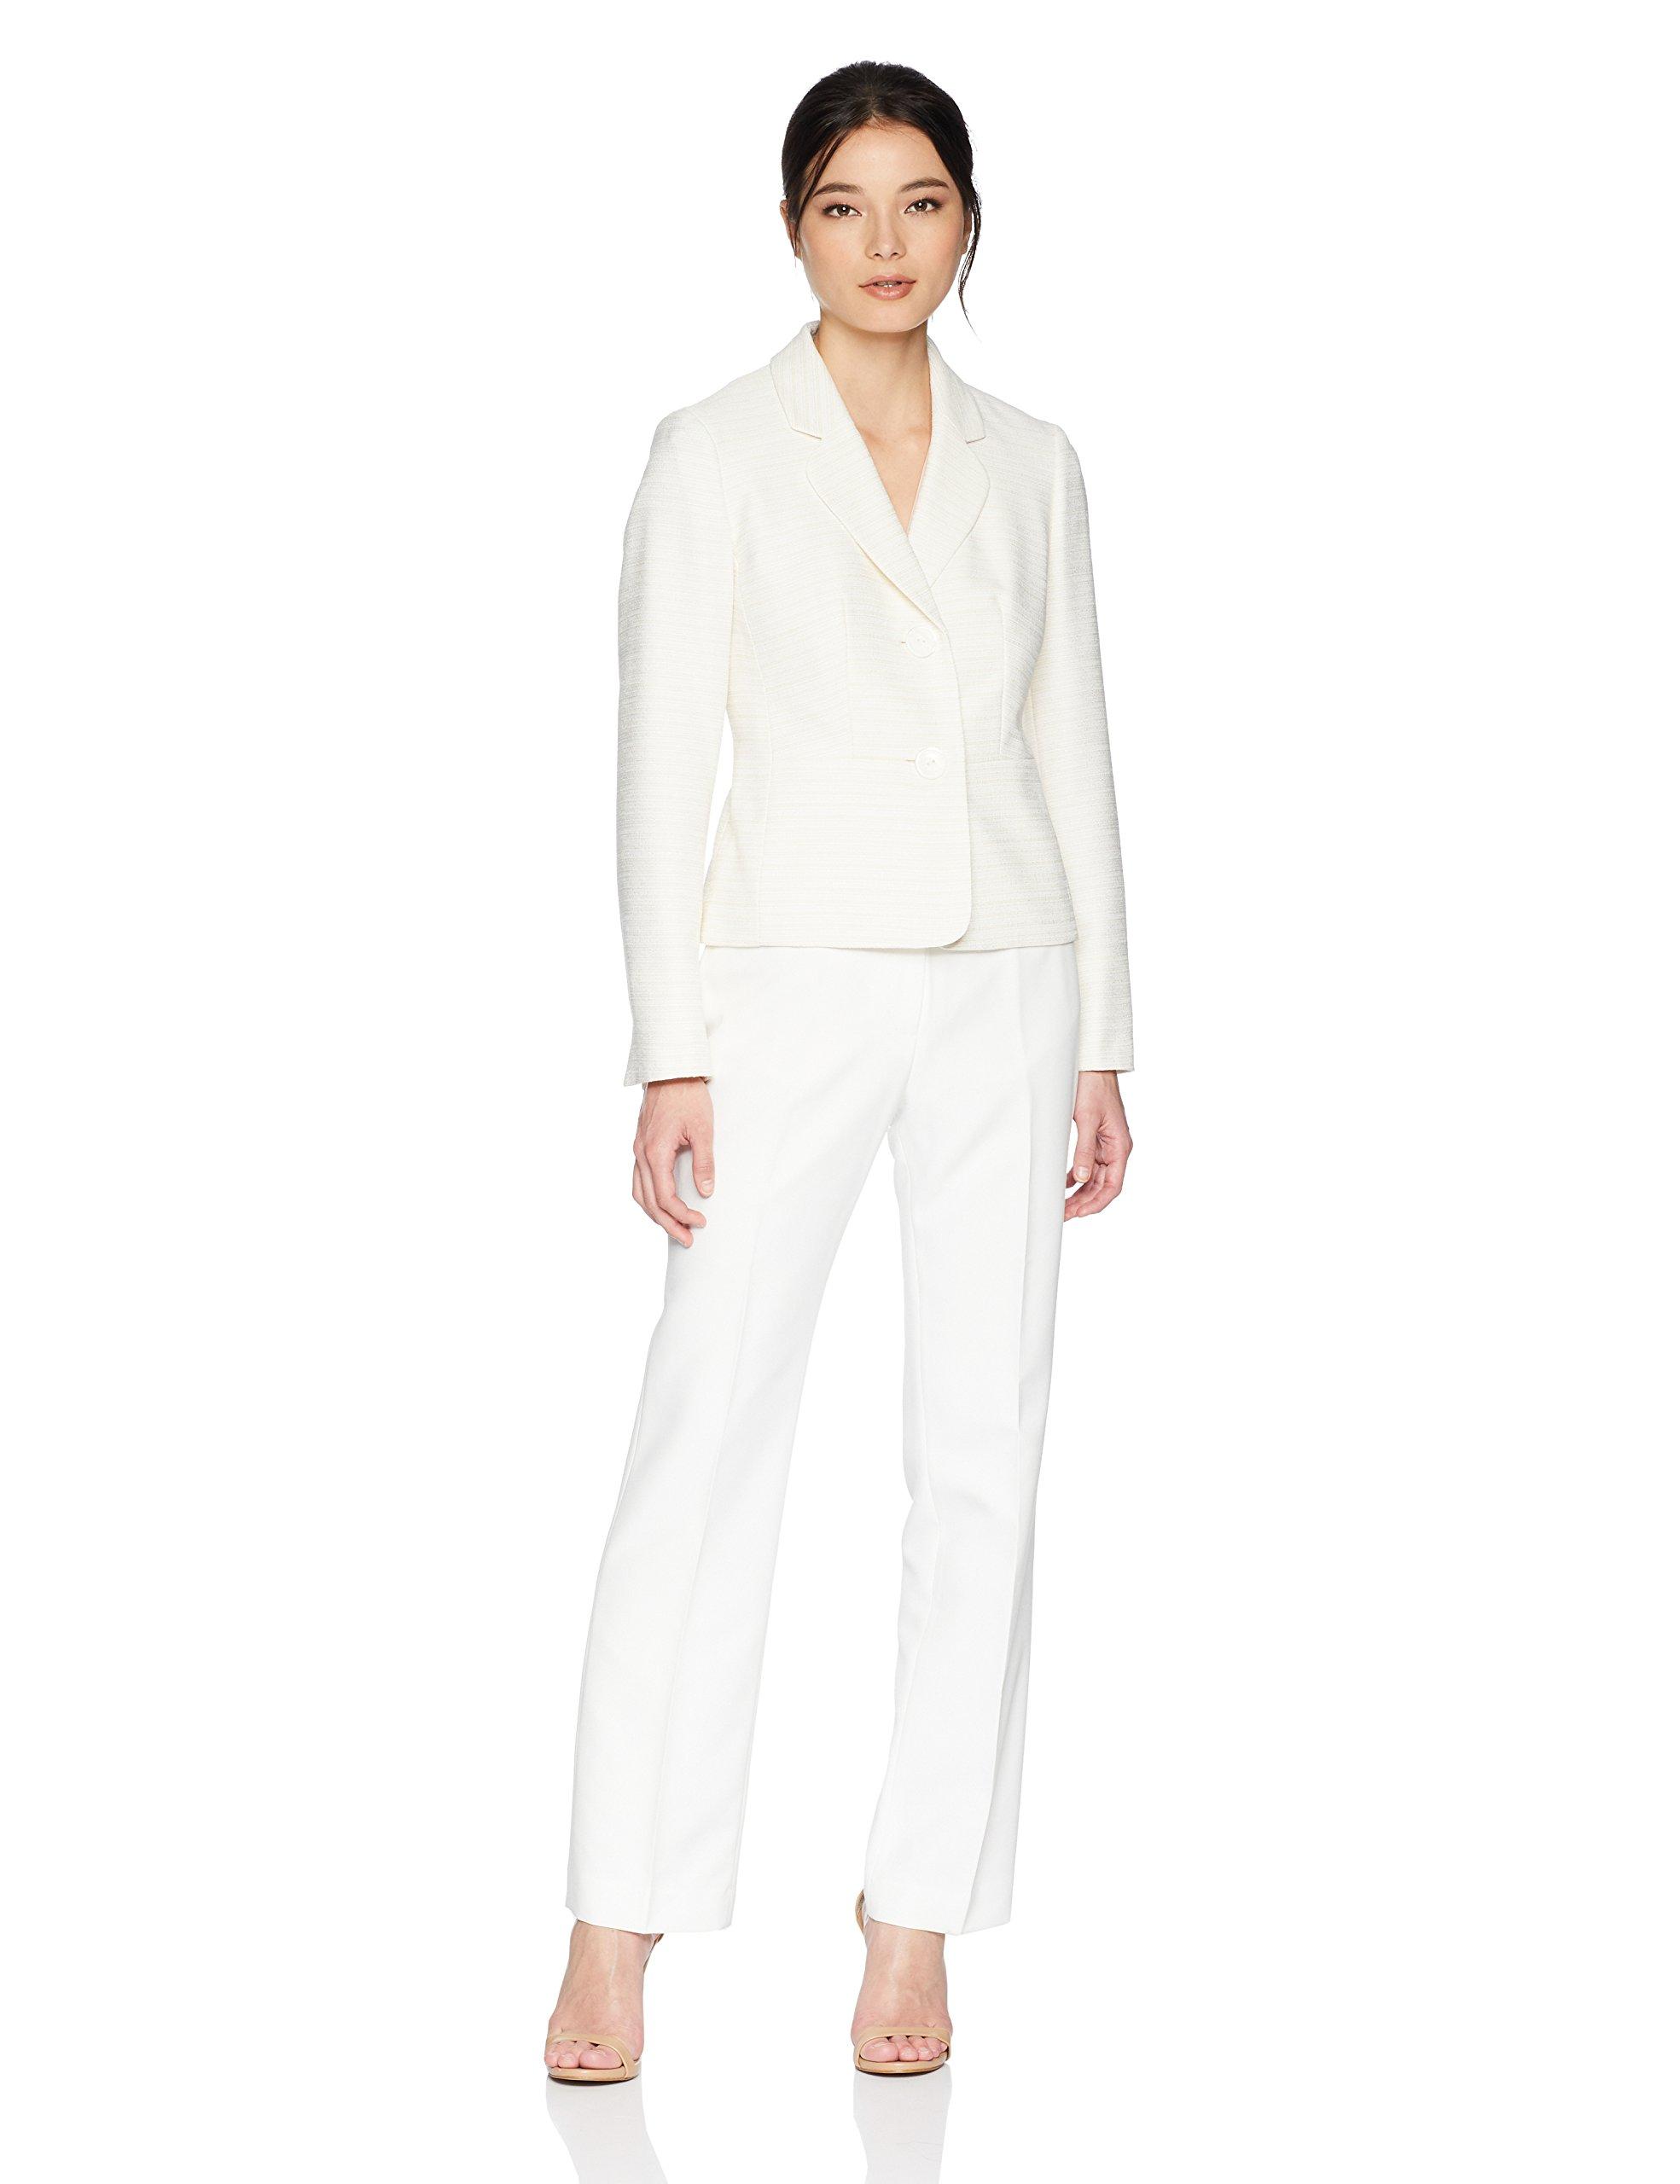 Le Suit Women's Petite Tweed 2 Button Notch Collar Pant Suit, Light Taupe/Lily White, 10P